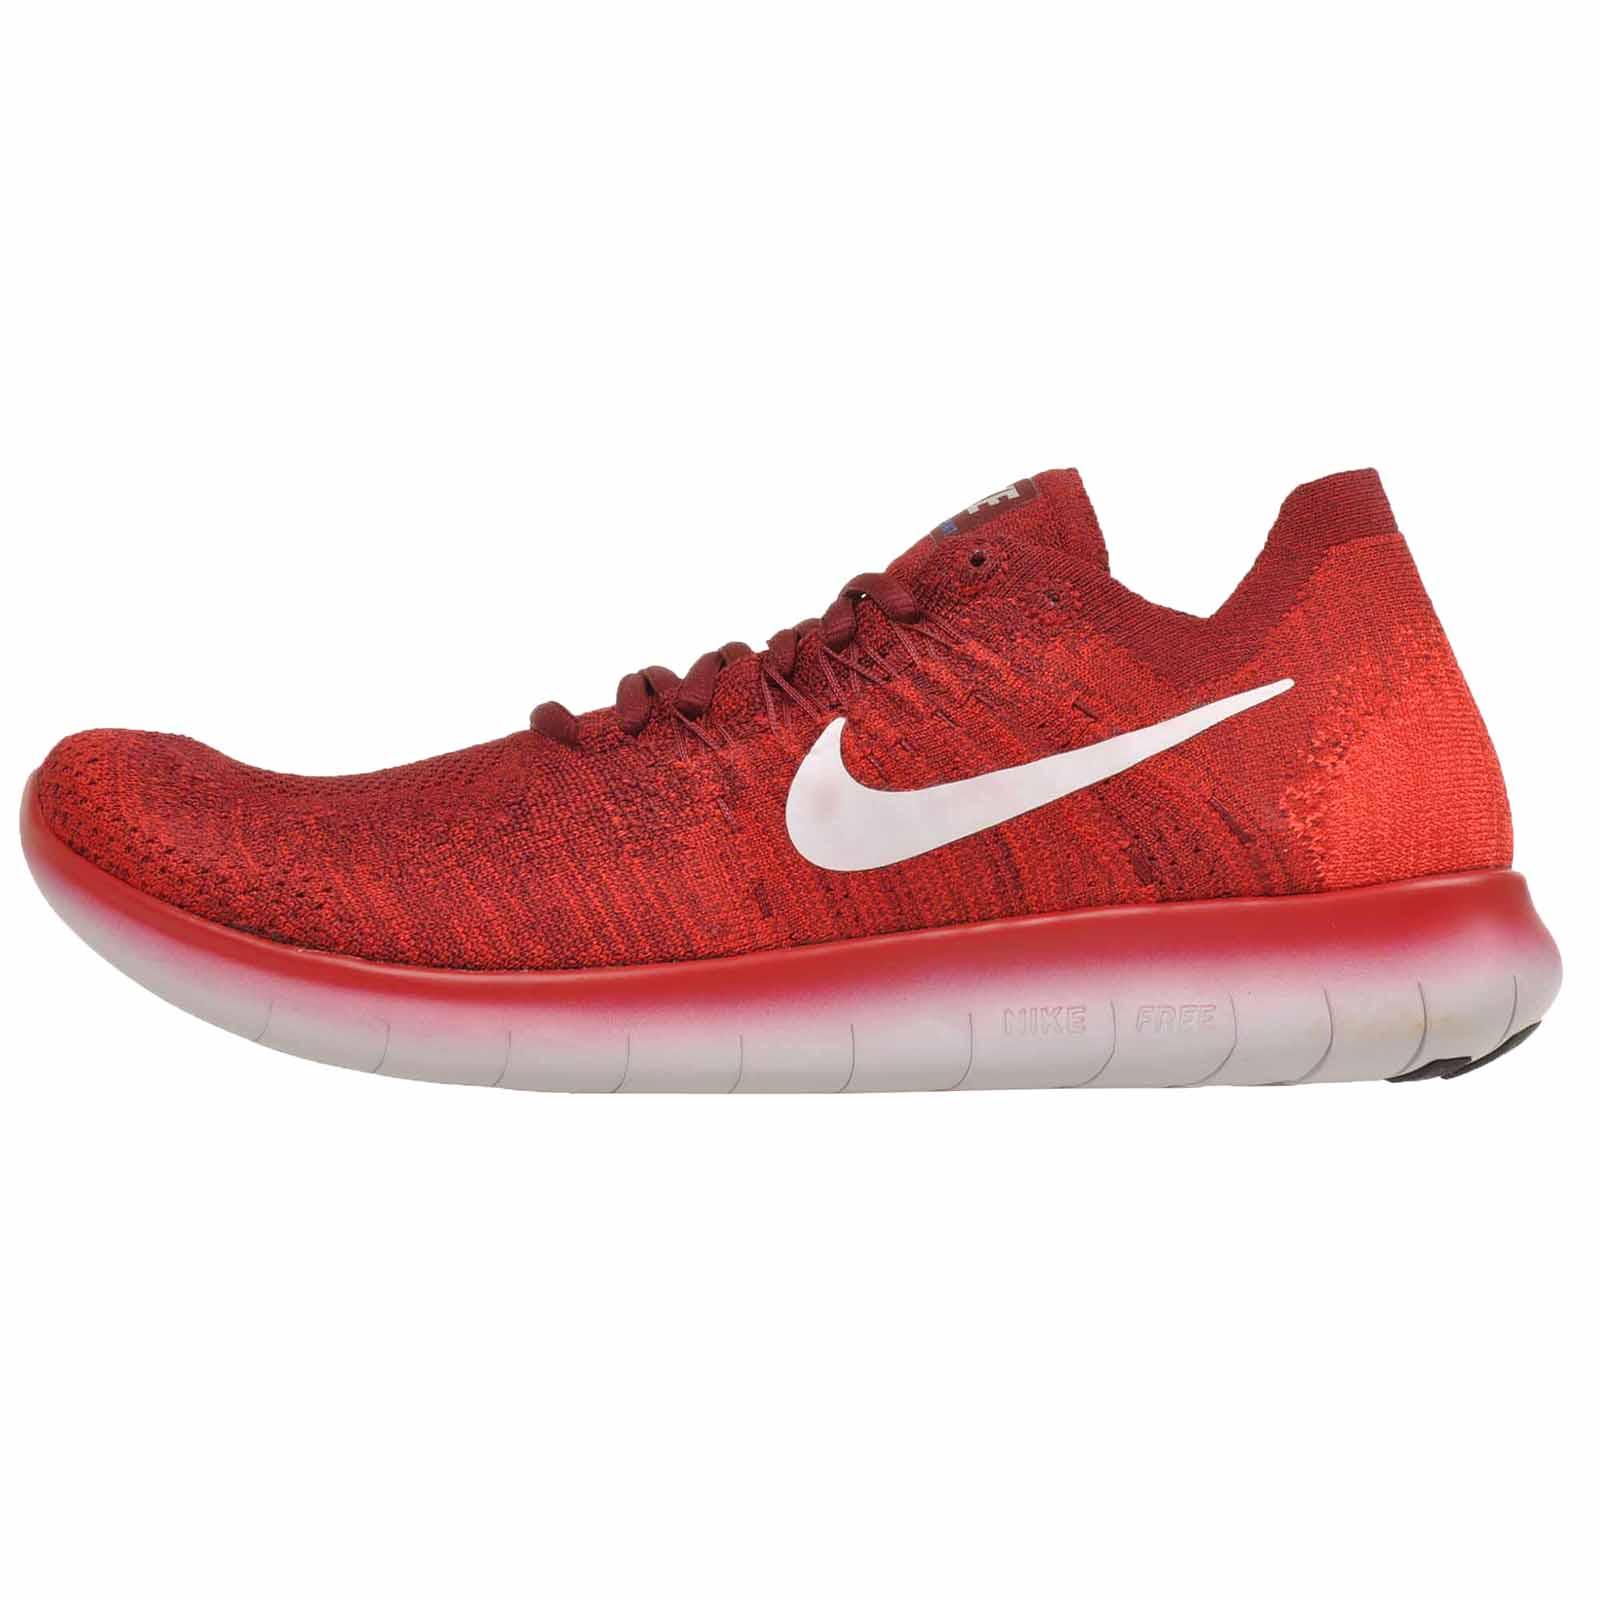 f9a6ef2f31744 ... ebay nike free rn flyknit 2017 running mens shoes team red 880843 600  55d6b dbc16